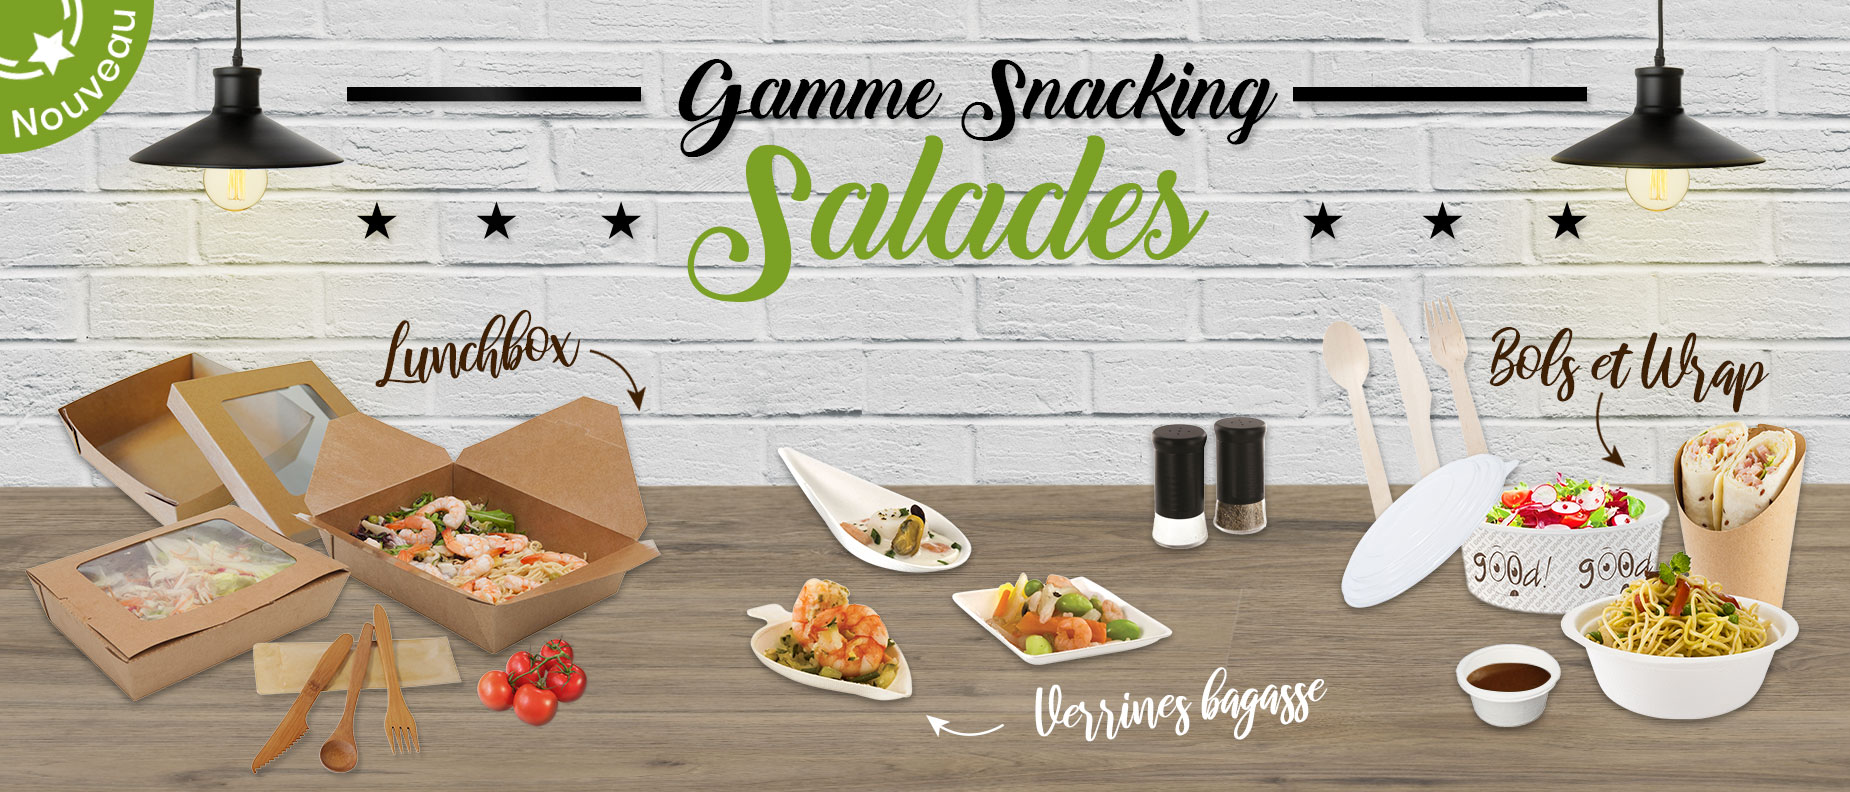 Snacking-Salade ok